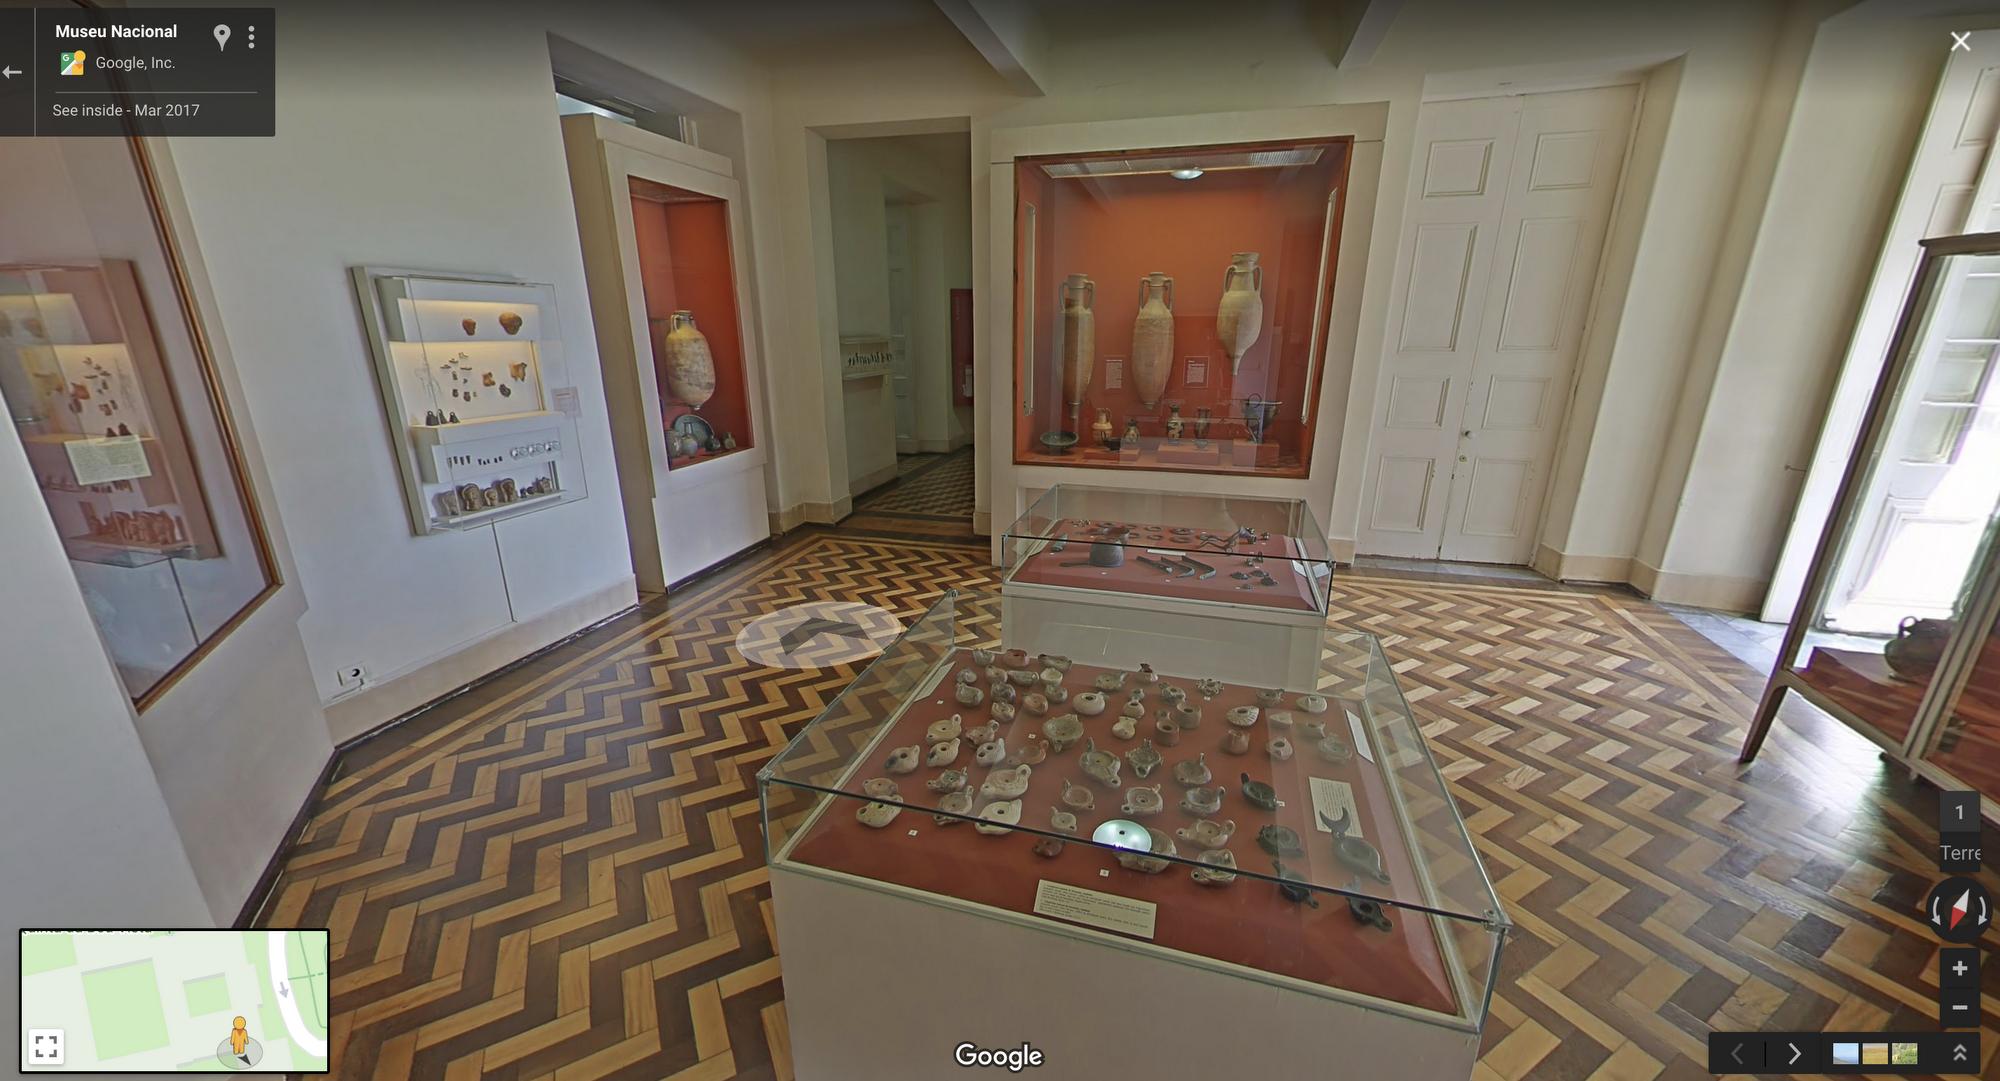 Inside Brazil's National Museum on Google Arts & Culture